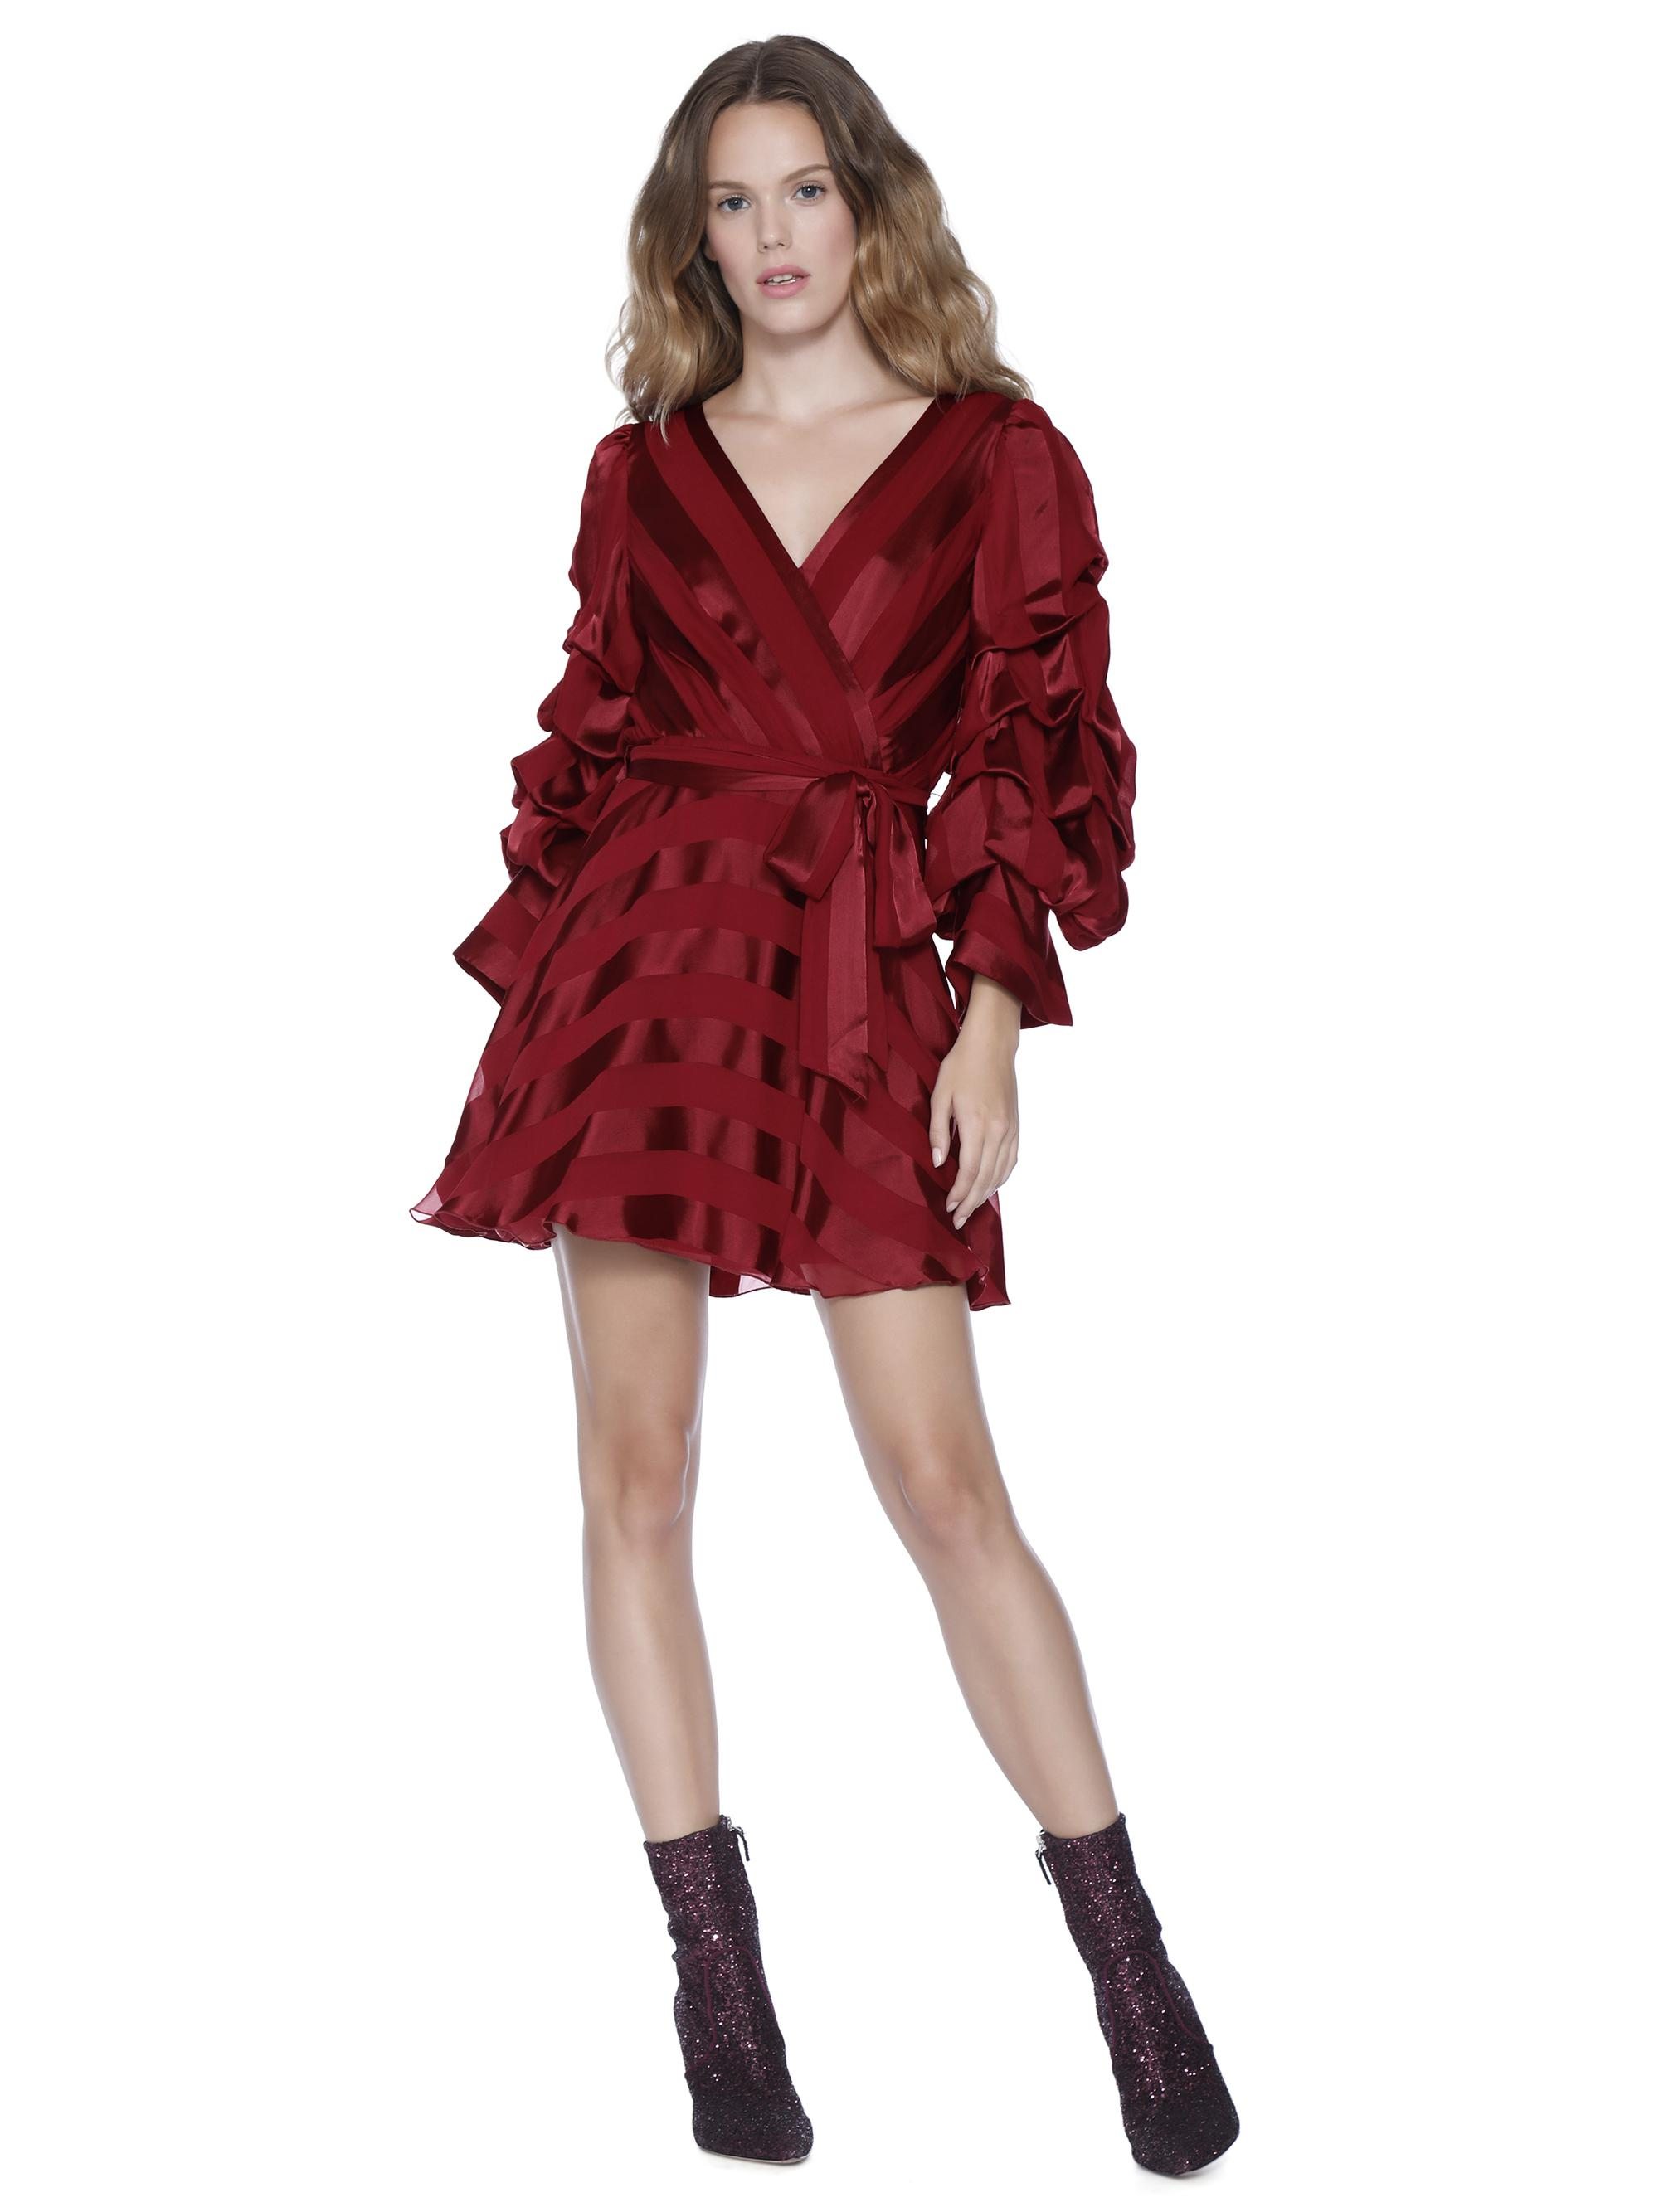 632728eea1bd1 Lyst - Alice + Olivia Santina Tuck Sleeve Shirt Dress in Red